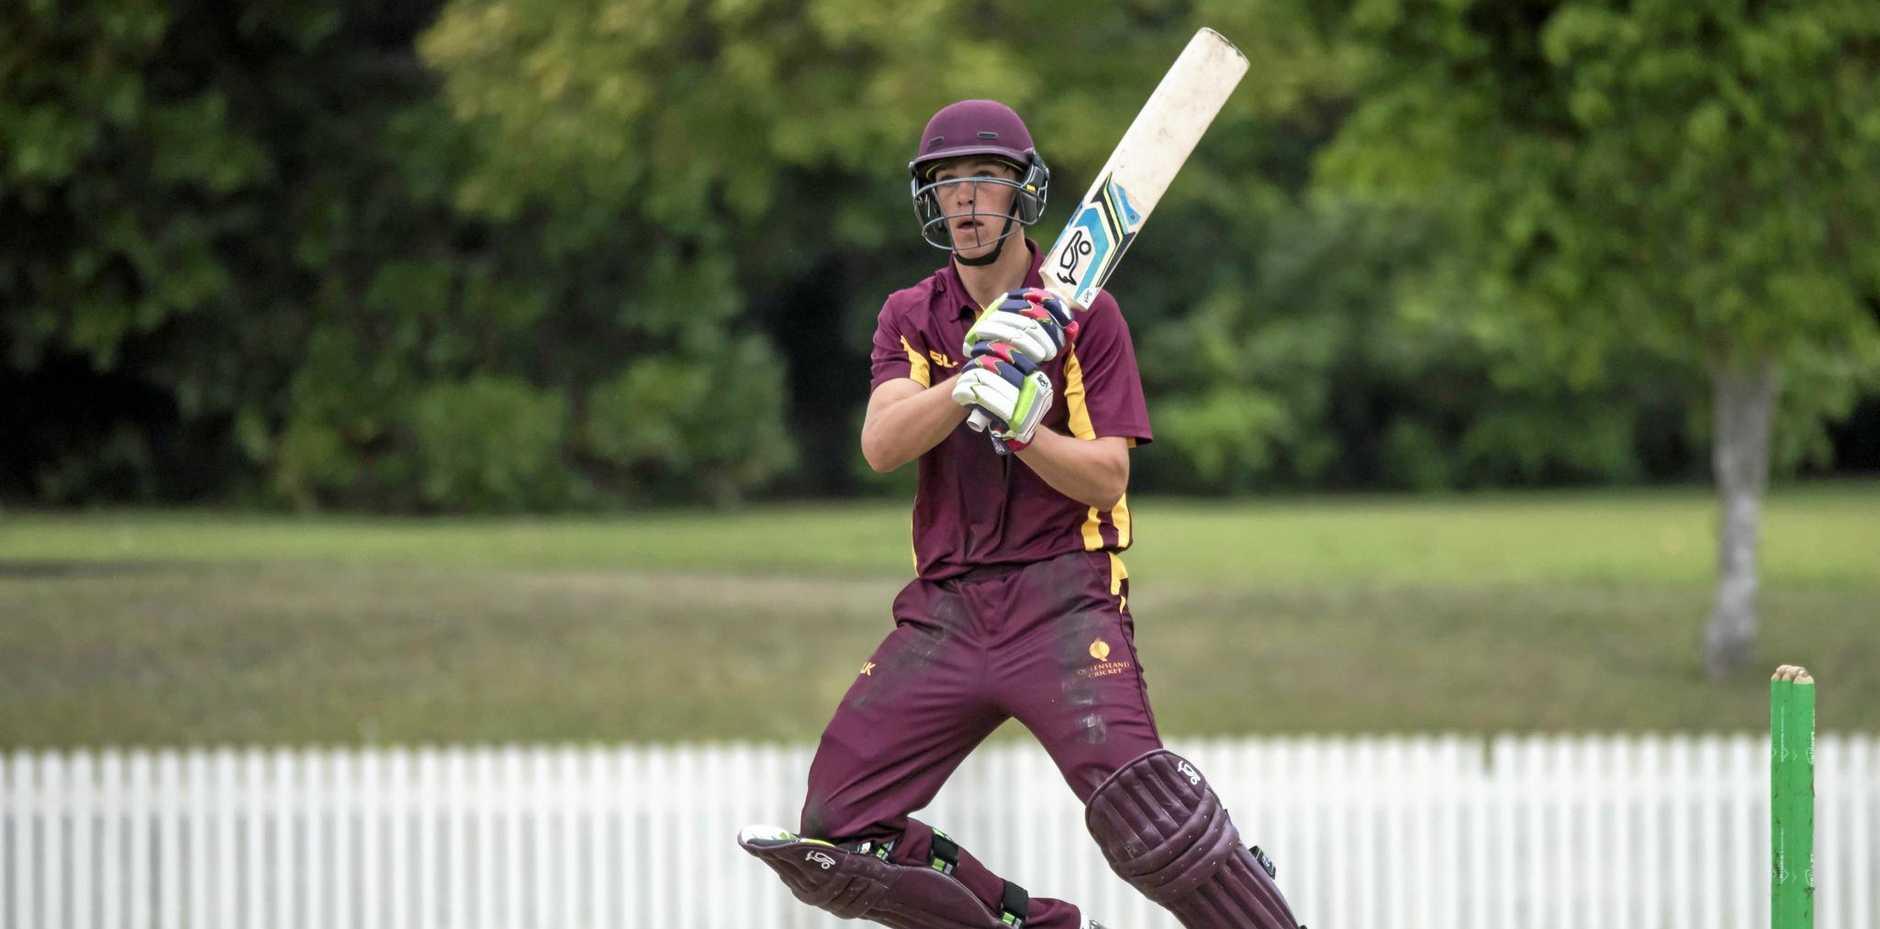 RUN SCORING MACHINE: Angus Lovell was player of the Australian under-17 championship.